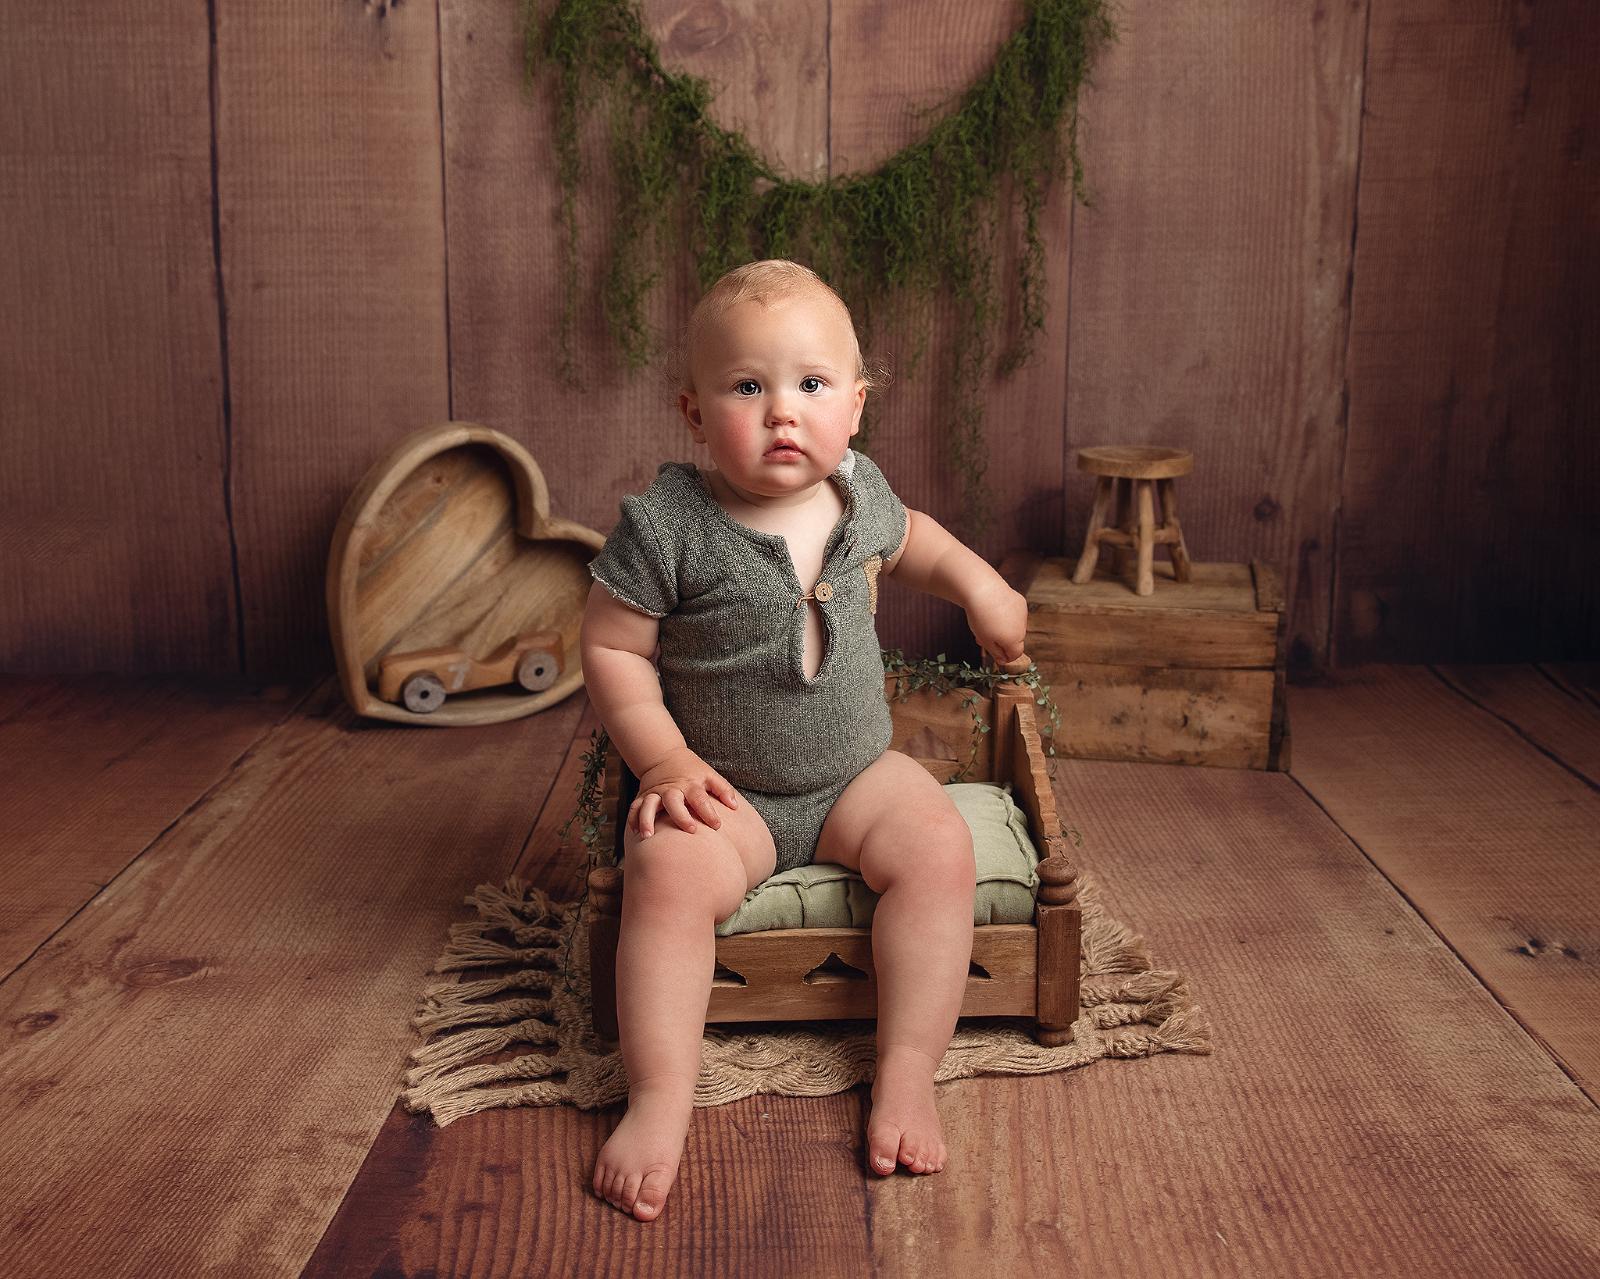 Baby boy sitter photo shoot in studio Hereford, Herefordshire